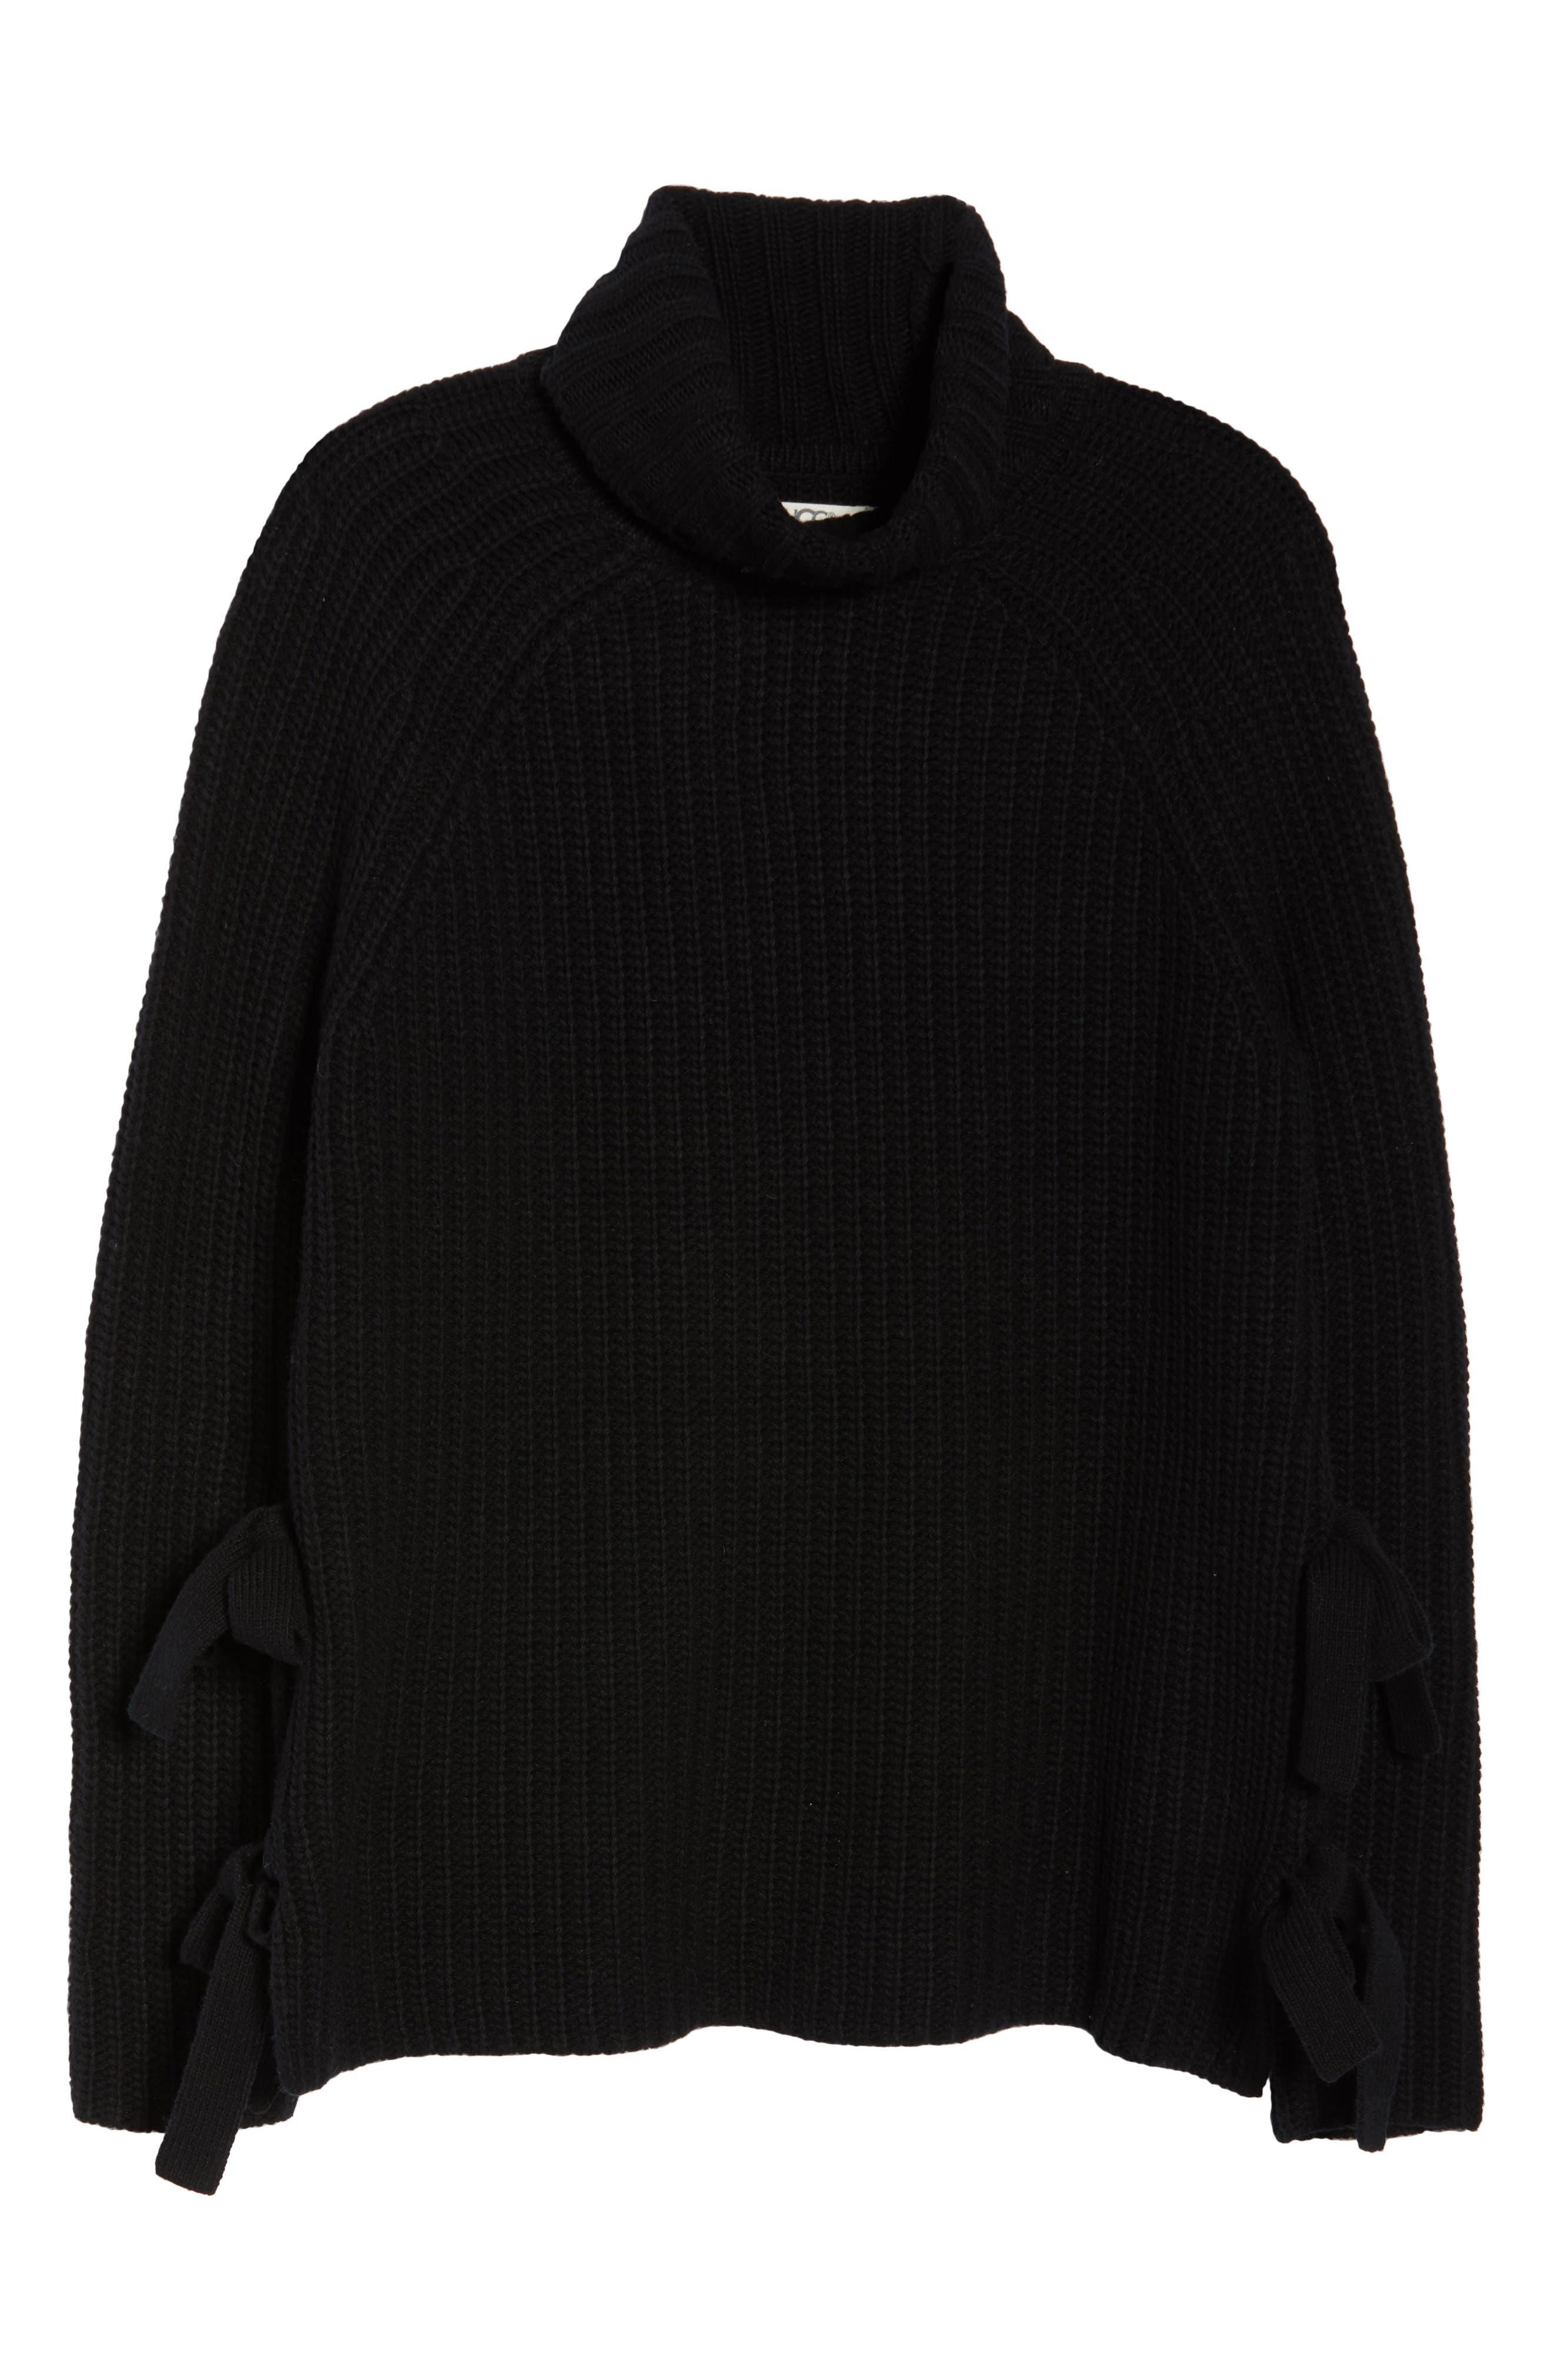 Ceanne Turtleneck Sweater,                             Alternate thumbnail 6, color,                             001